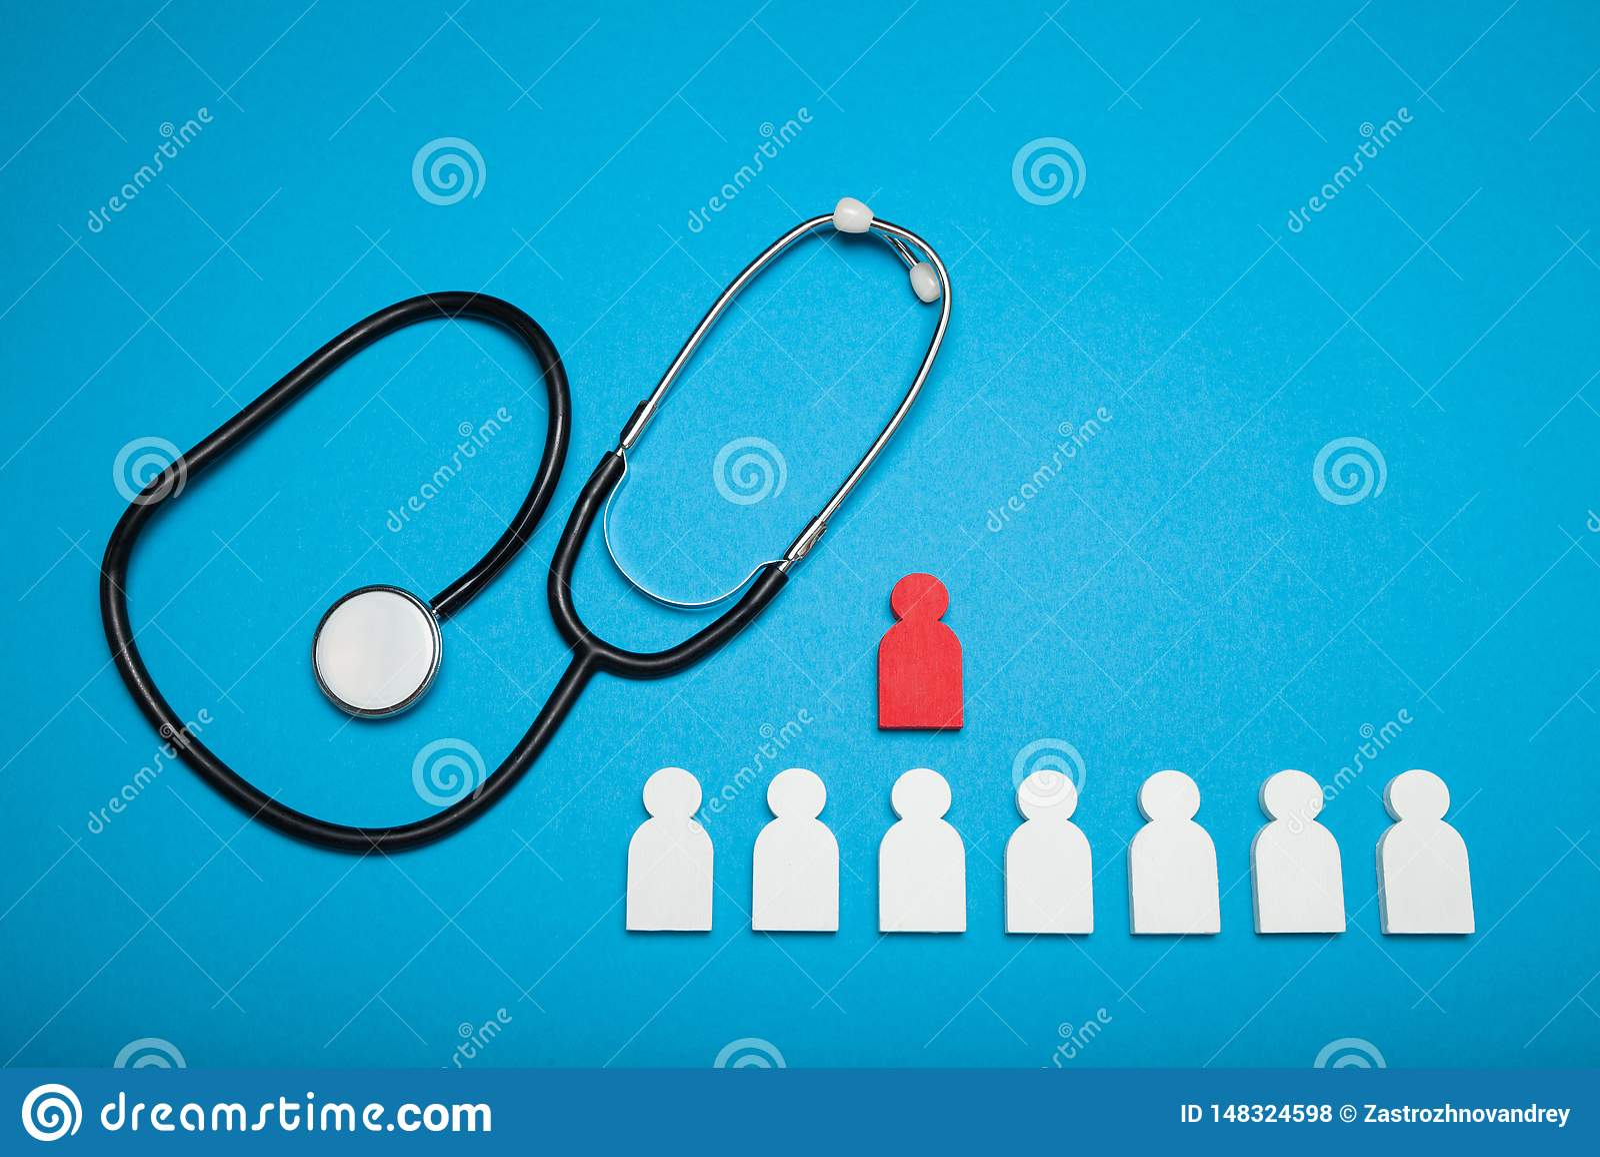 Медицинское страхование, забота помощи Цена здравоохранения